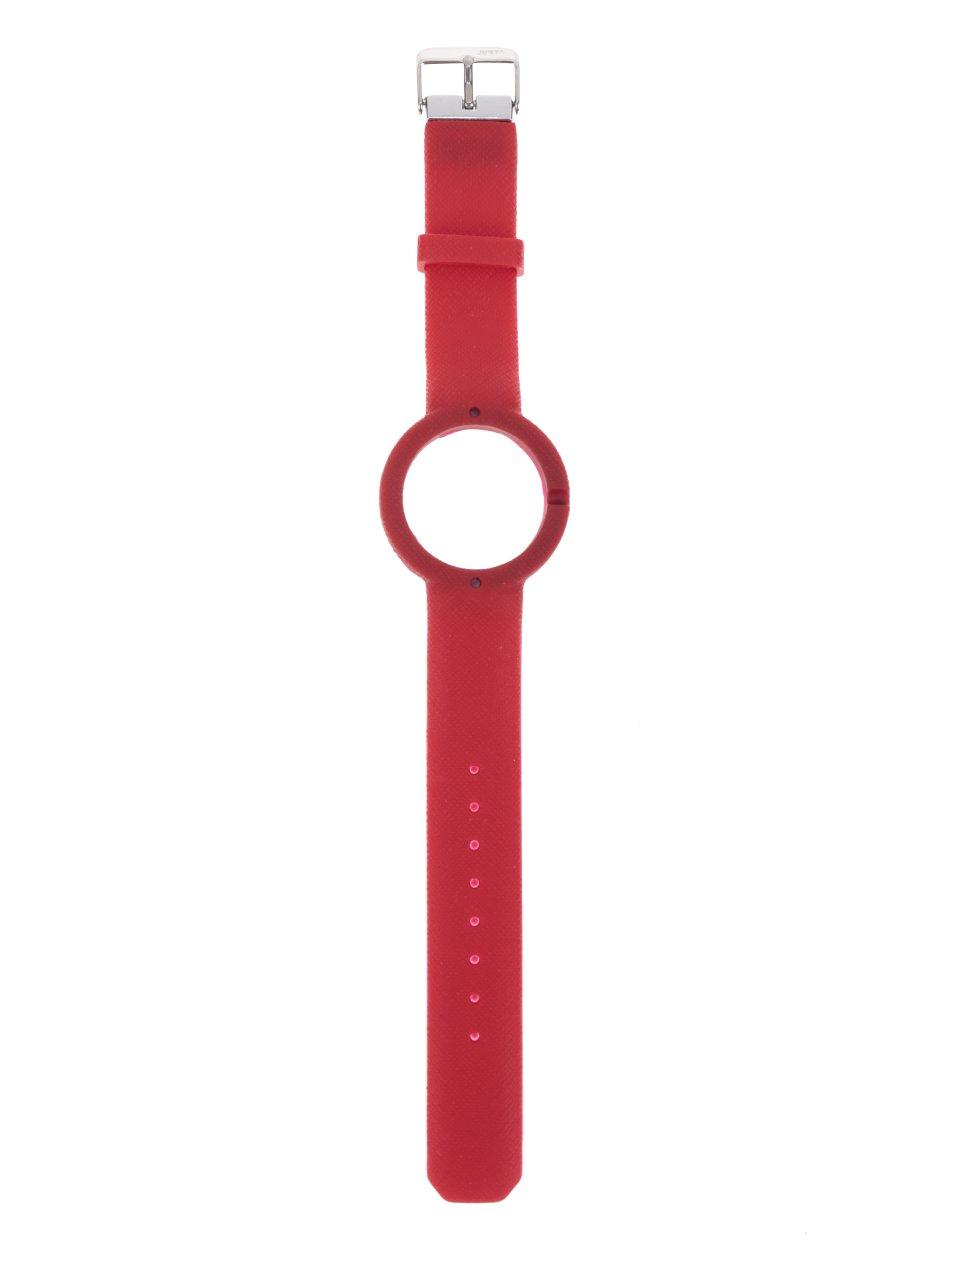 Červený gumový pásek k hodinkám Ju'sto Rosso 40 mm